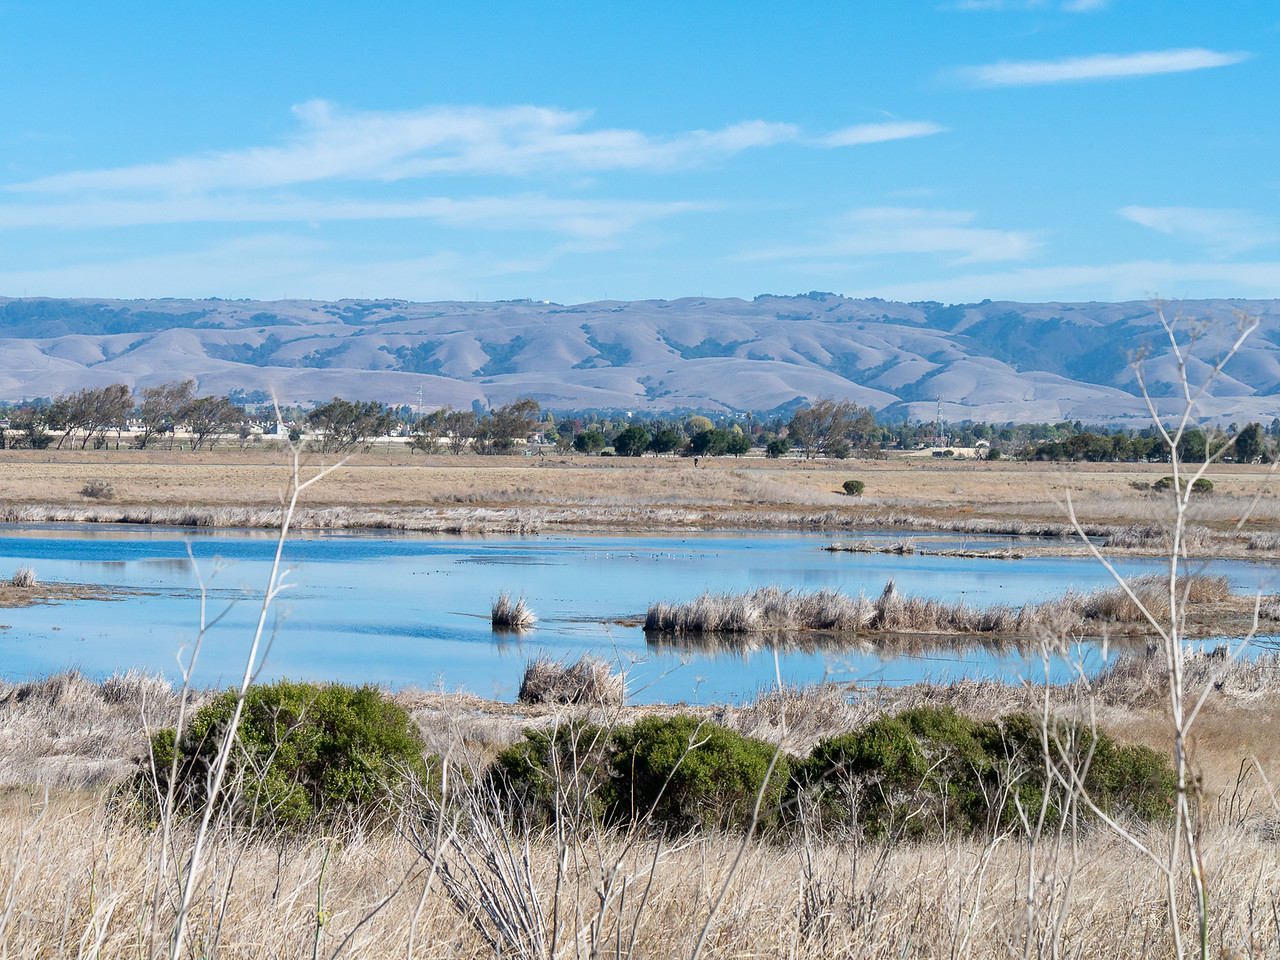 North Marsh, closer to Alameda Creek, had water.